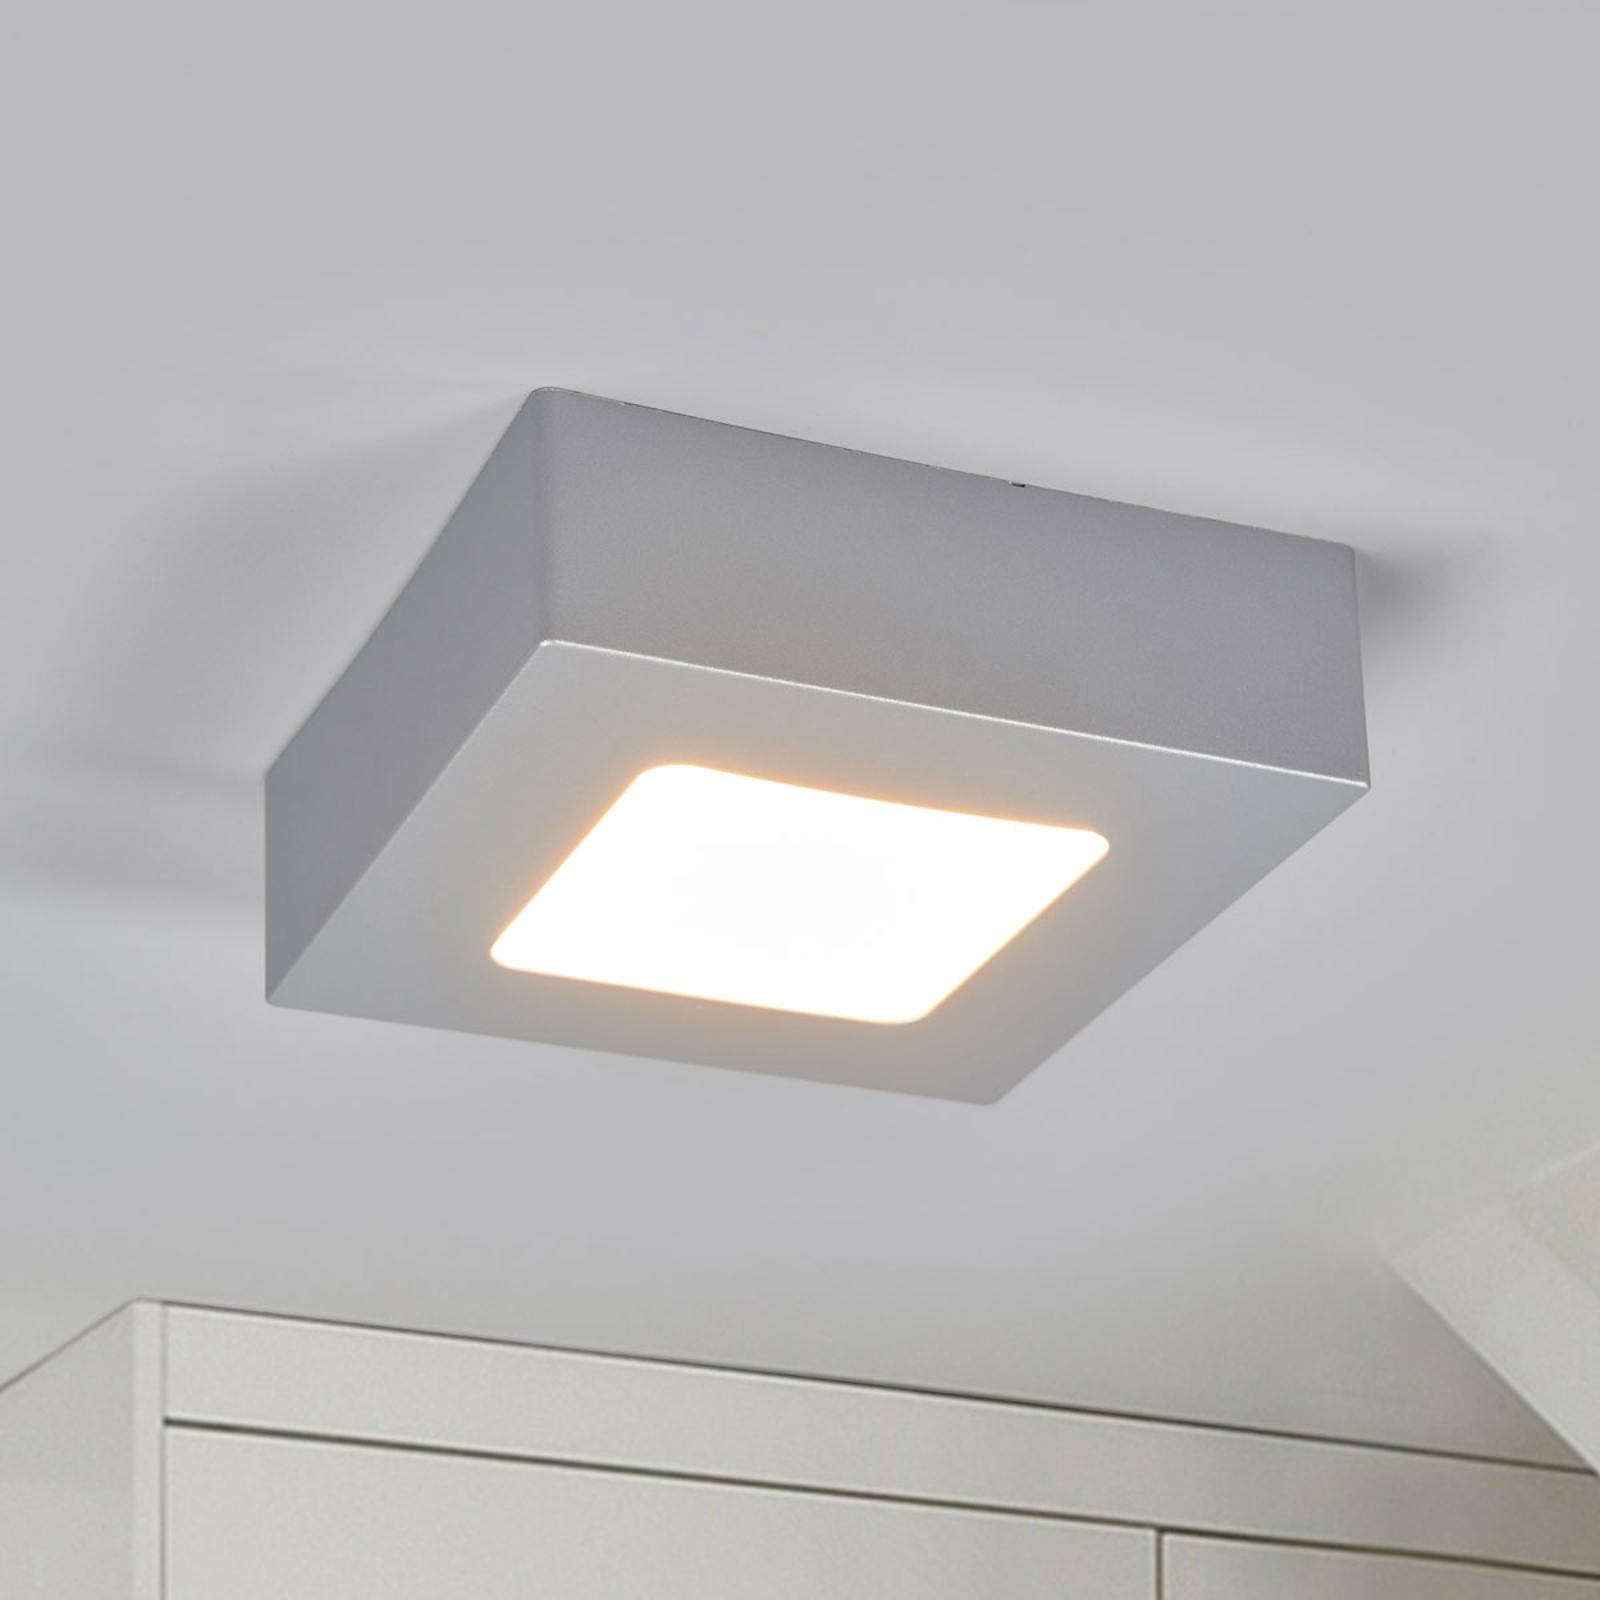 LED-kattovalo Marlo hopea 3000K kulmikas 12,8 cm